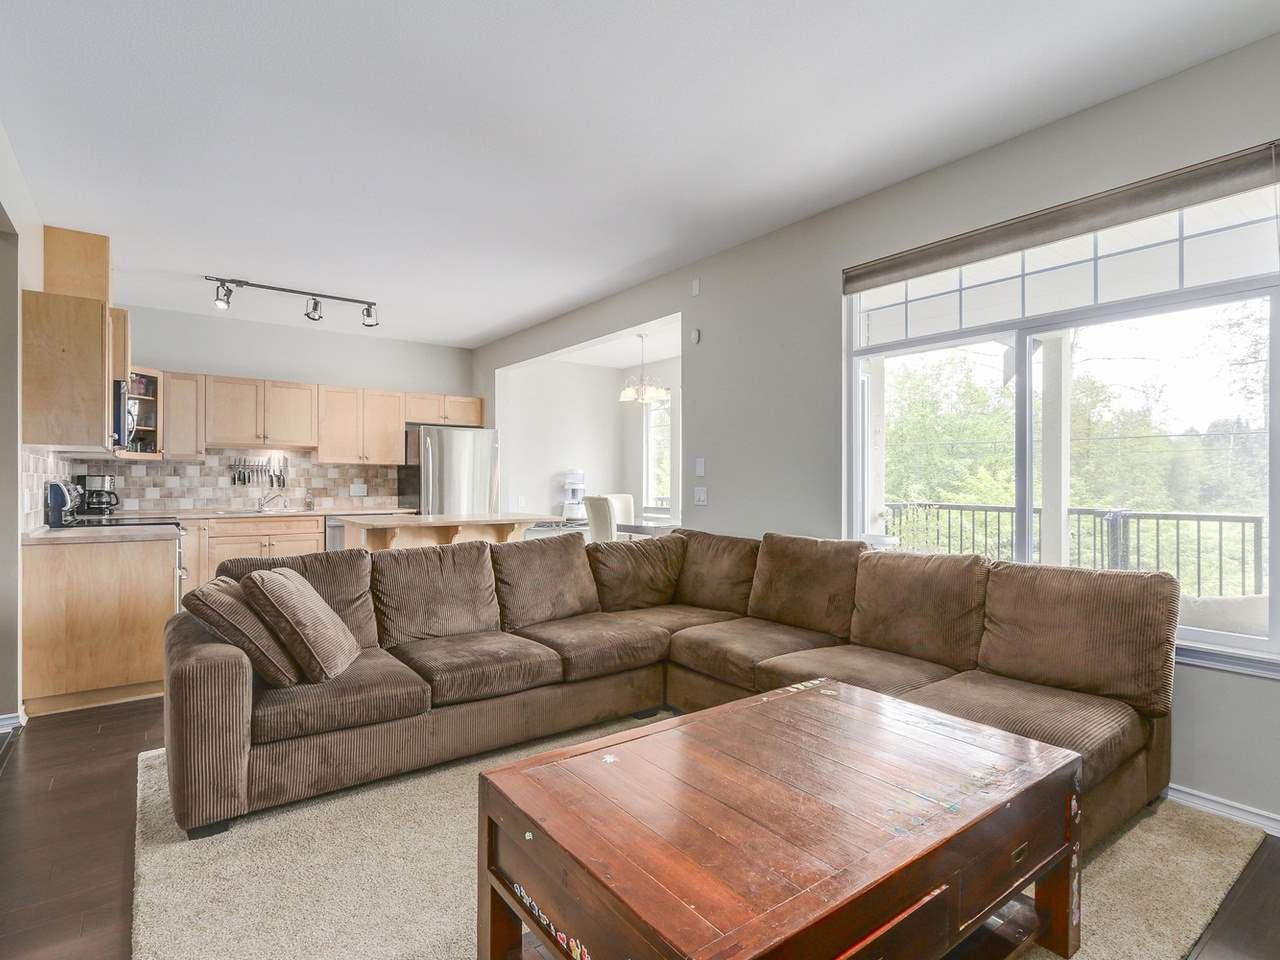 "Photo 7: Photos: 2 23233 KANAKA Way in Maple Ridge: Cottonwood MR Townhouse for sale in ""RIVERWOOD"" : MLS®# R2112549"